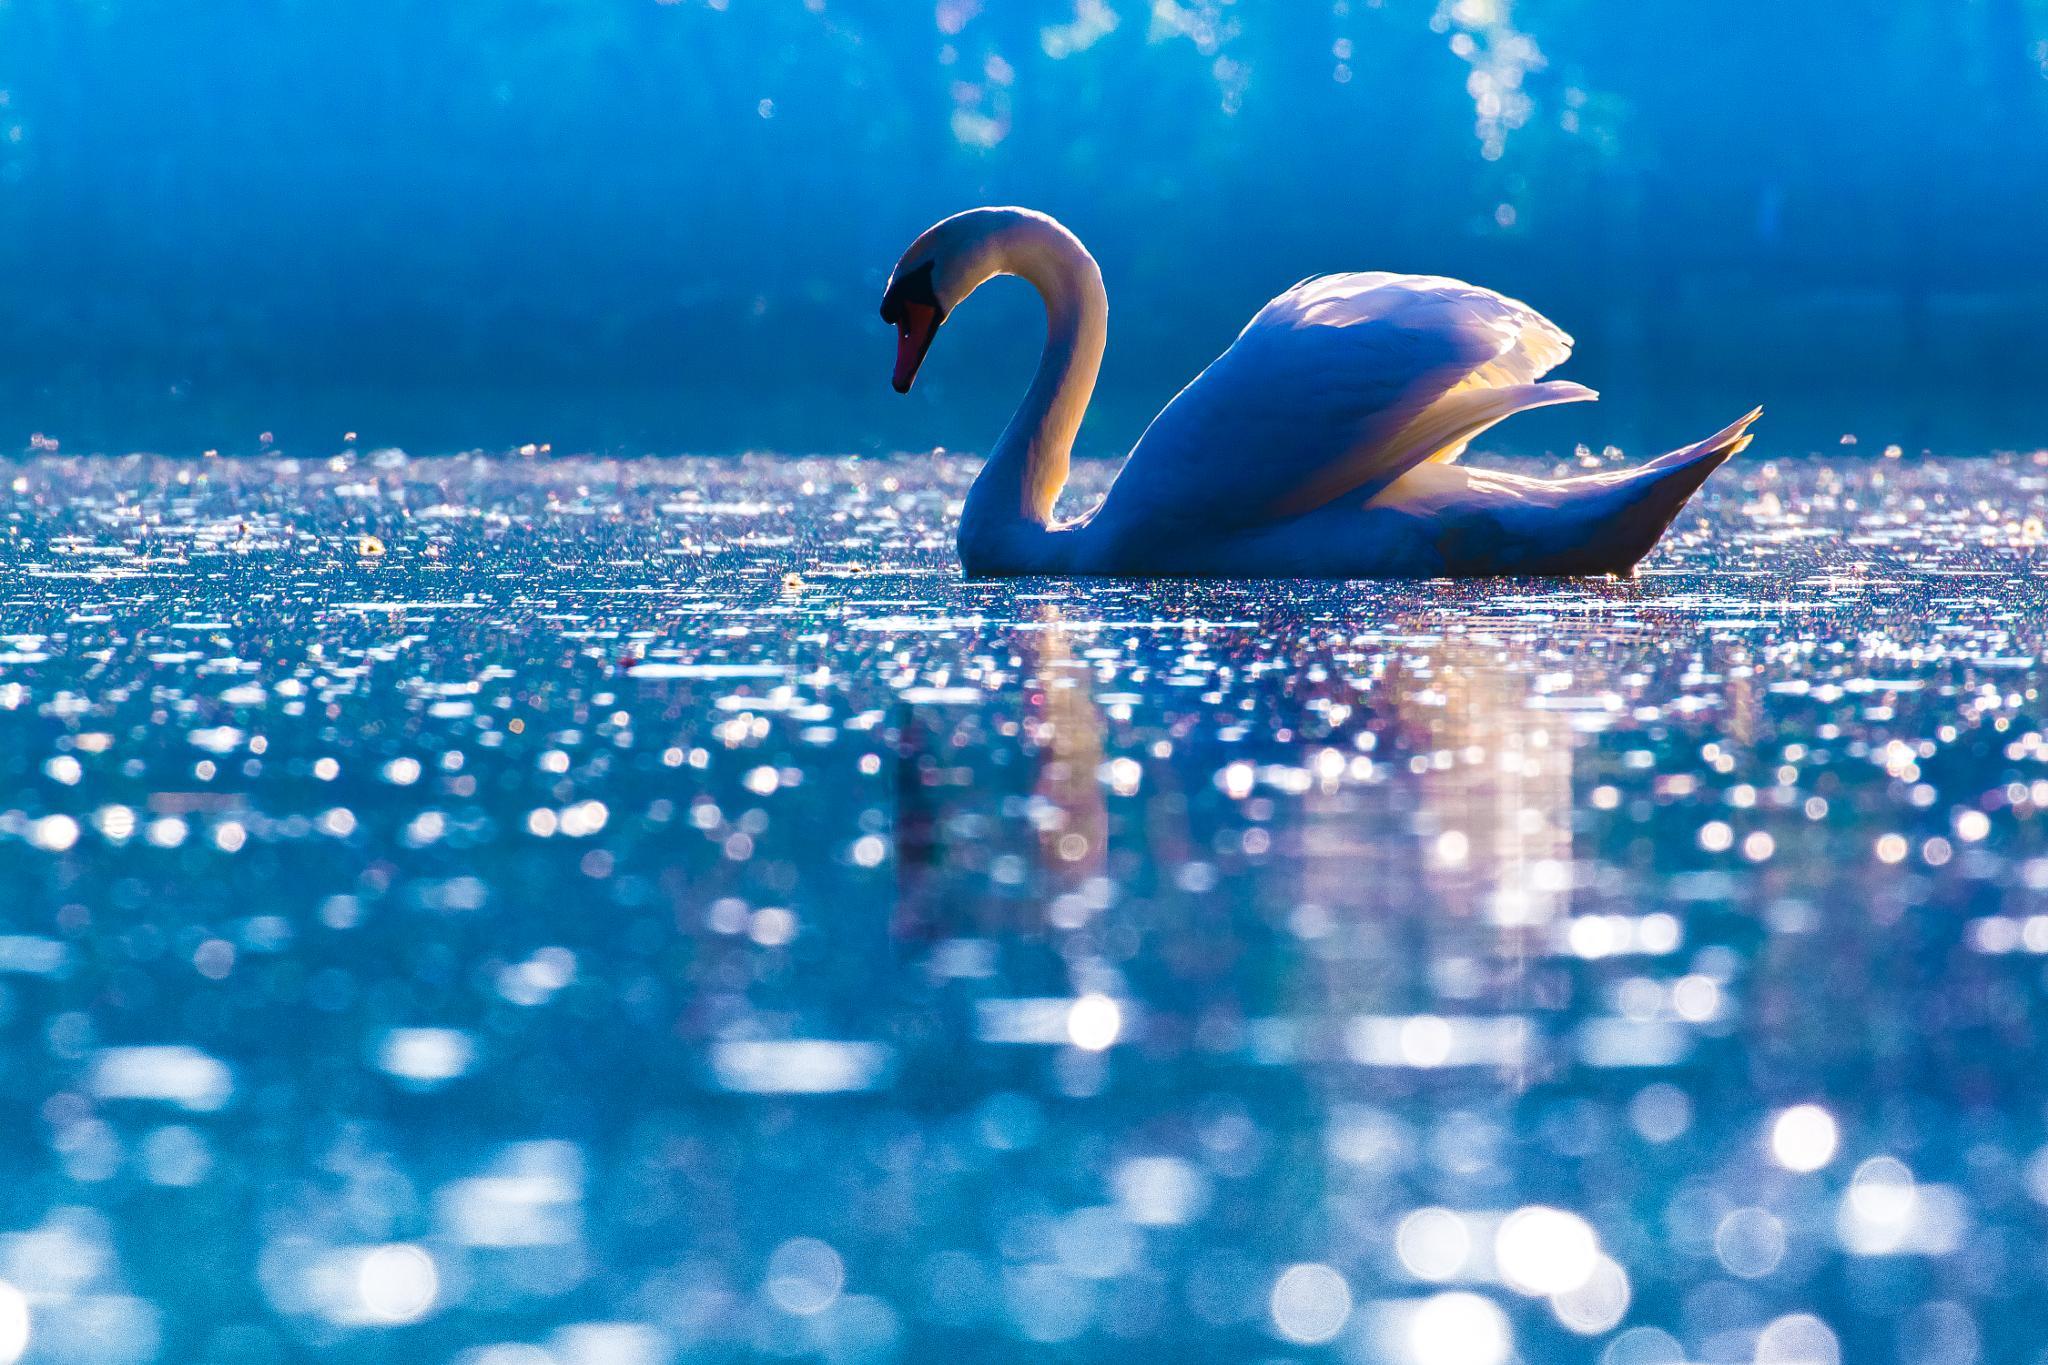 Blue Swan by messedupmojo